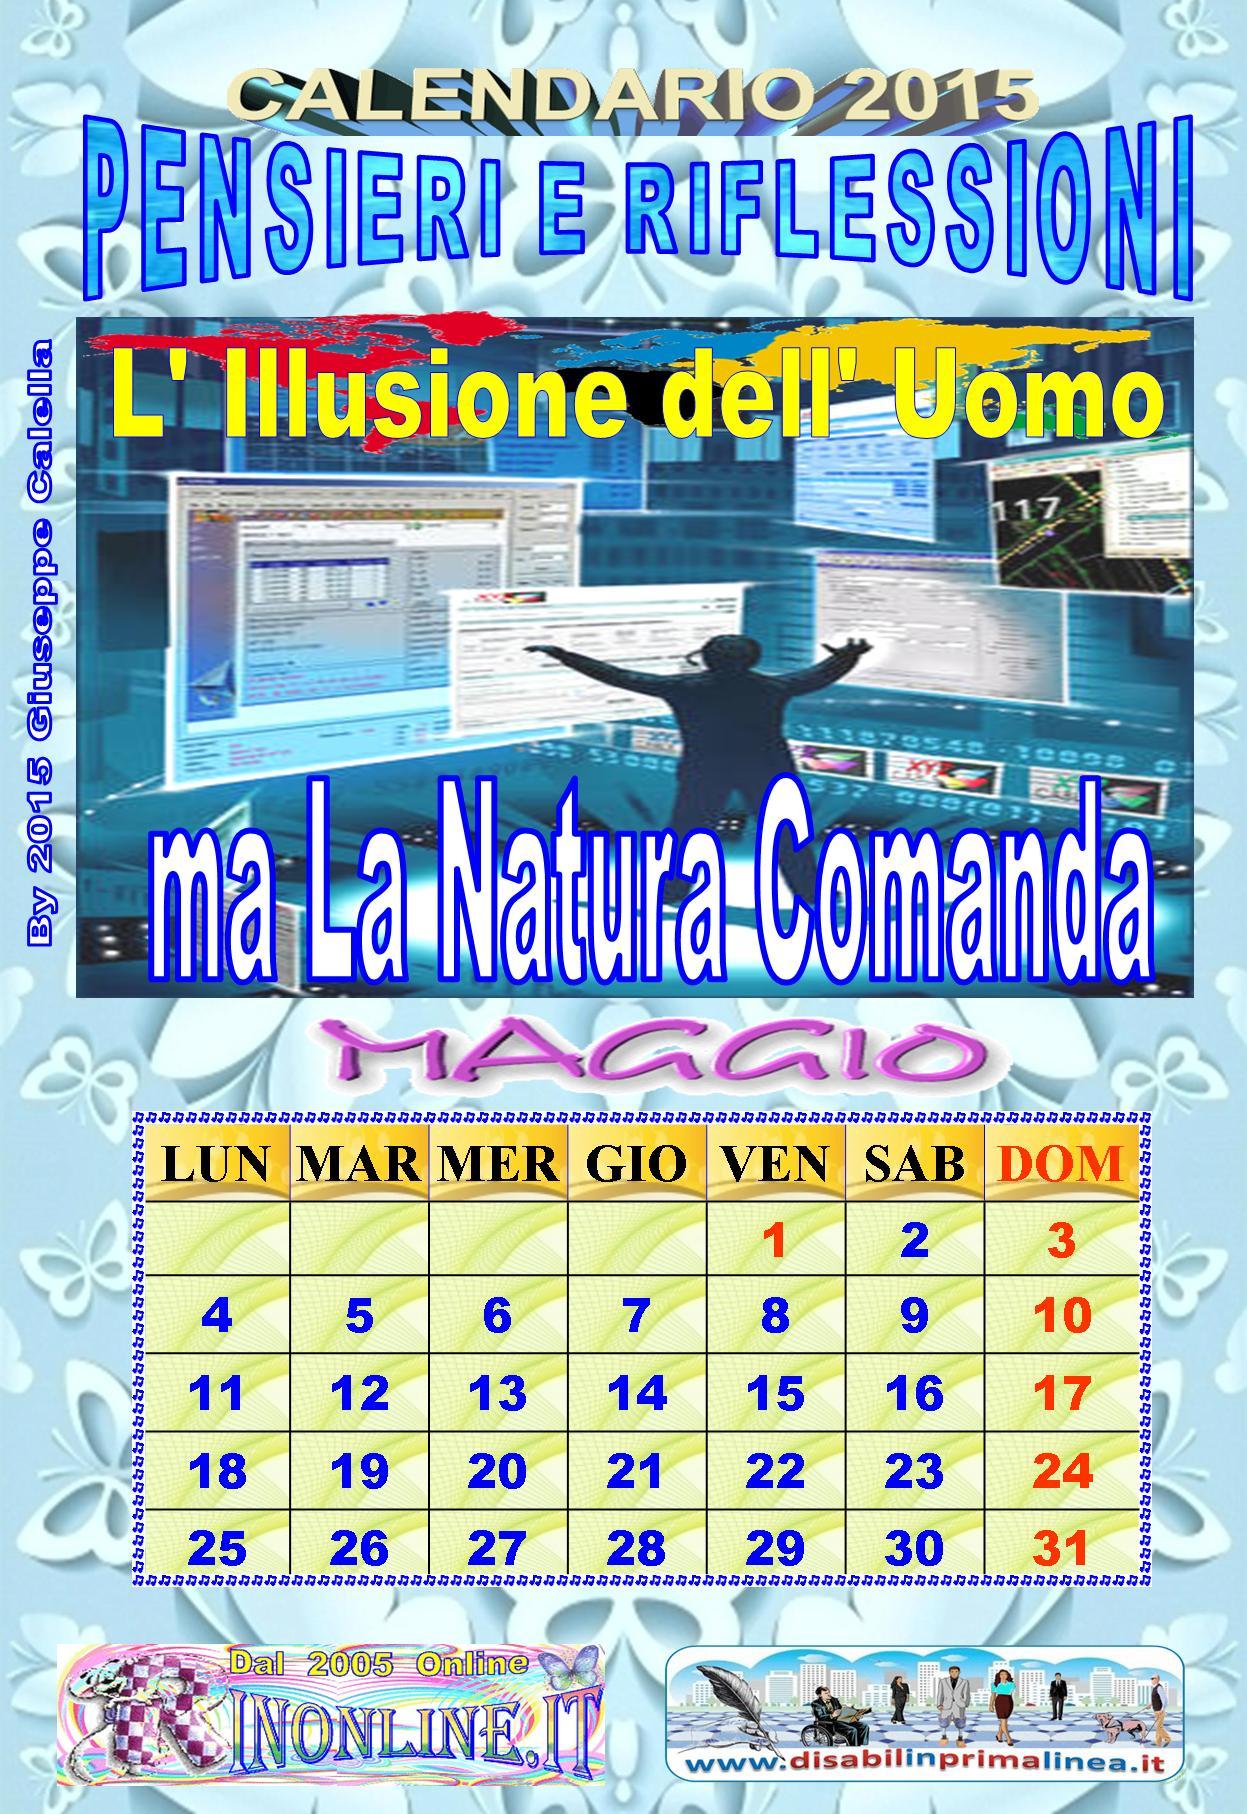 maggio_calendario_2015_pensieri_riflessioni_giuseppe_calella